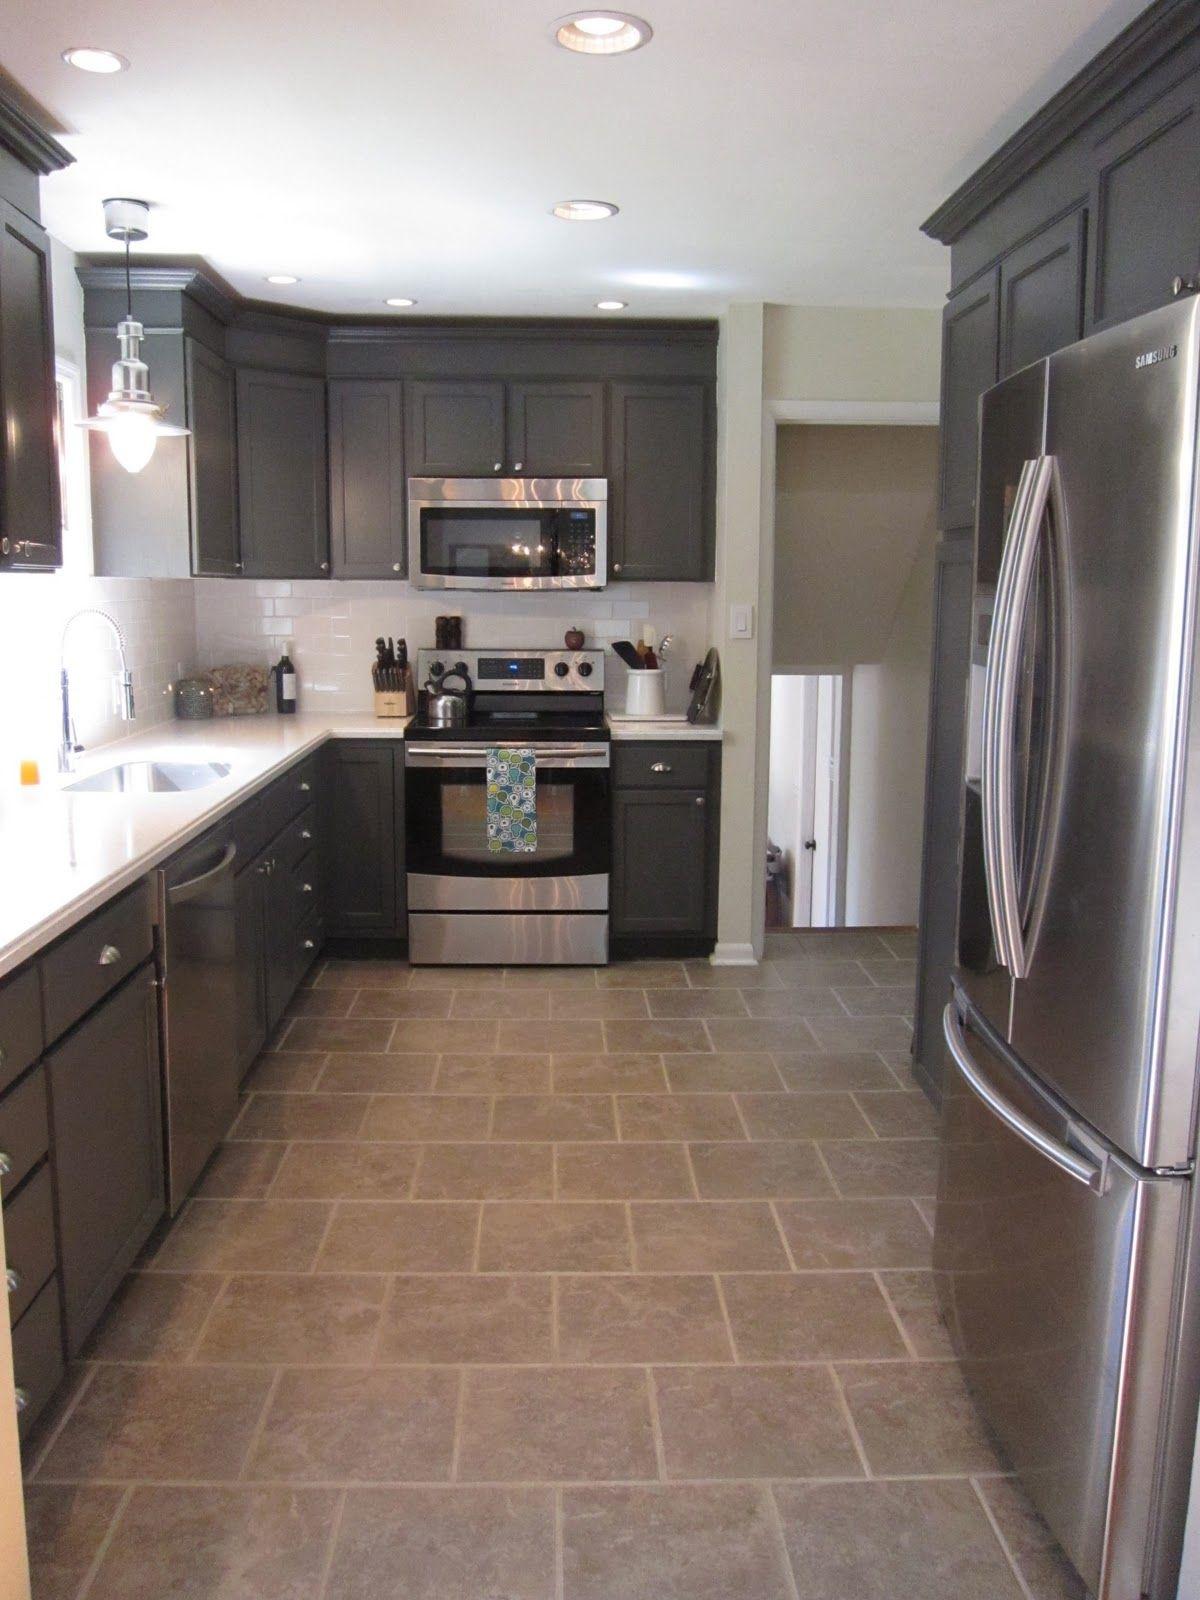 Kitchen Floor Tile Ideas With Dark Cabinets Dark Grey Kitchen Cabinets White Kitchen Makeover Grey Kitchen Cabinets